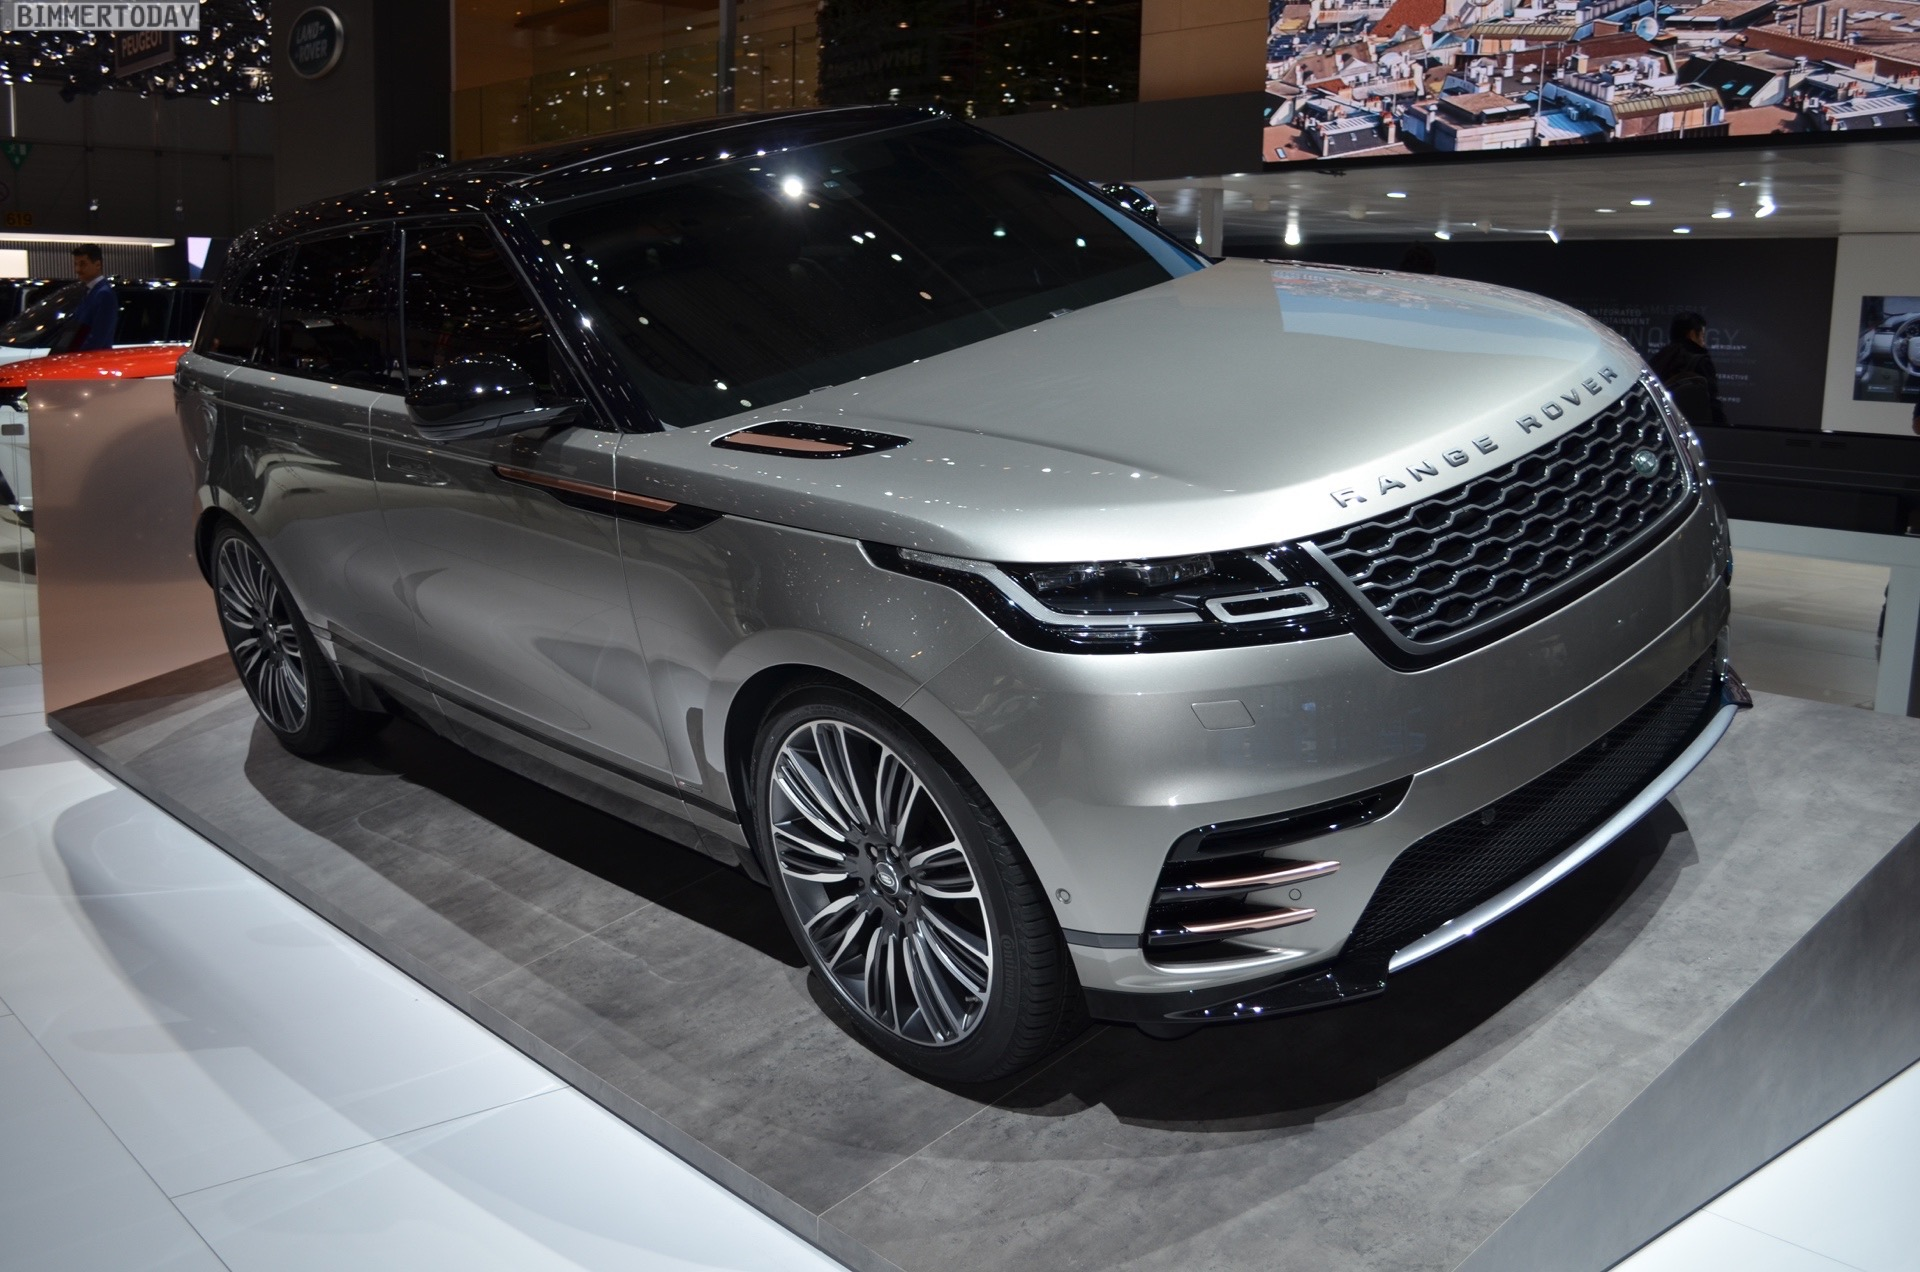 Genf 2017 Range Rover Velar Nimmt Bmw X5 Amp Co Ins Visier